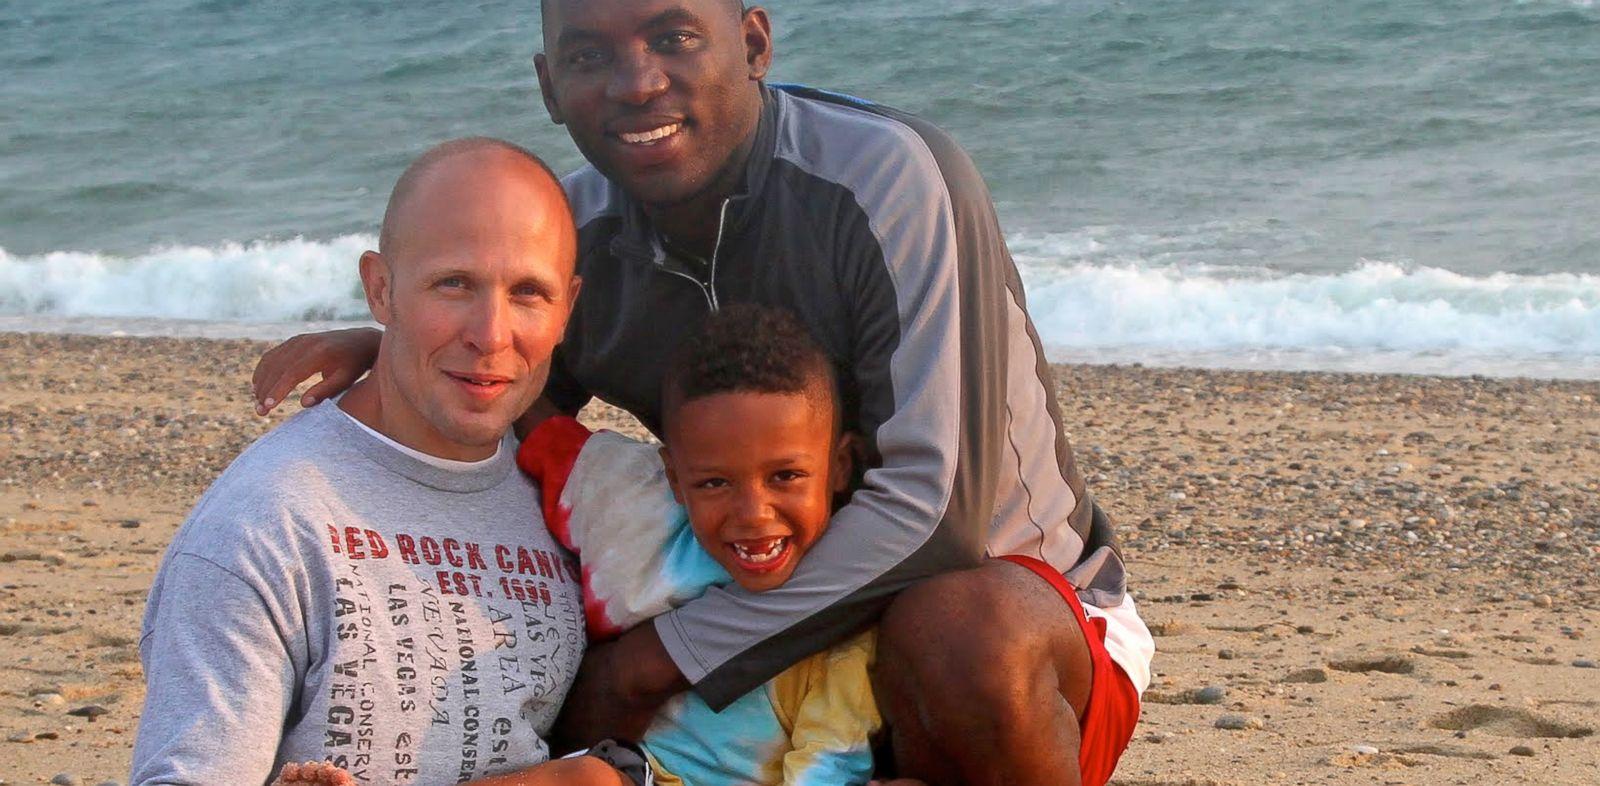 PHOTO: Philip McAdoo, his partner, Sean Cavanaugh, and their son Zaden.